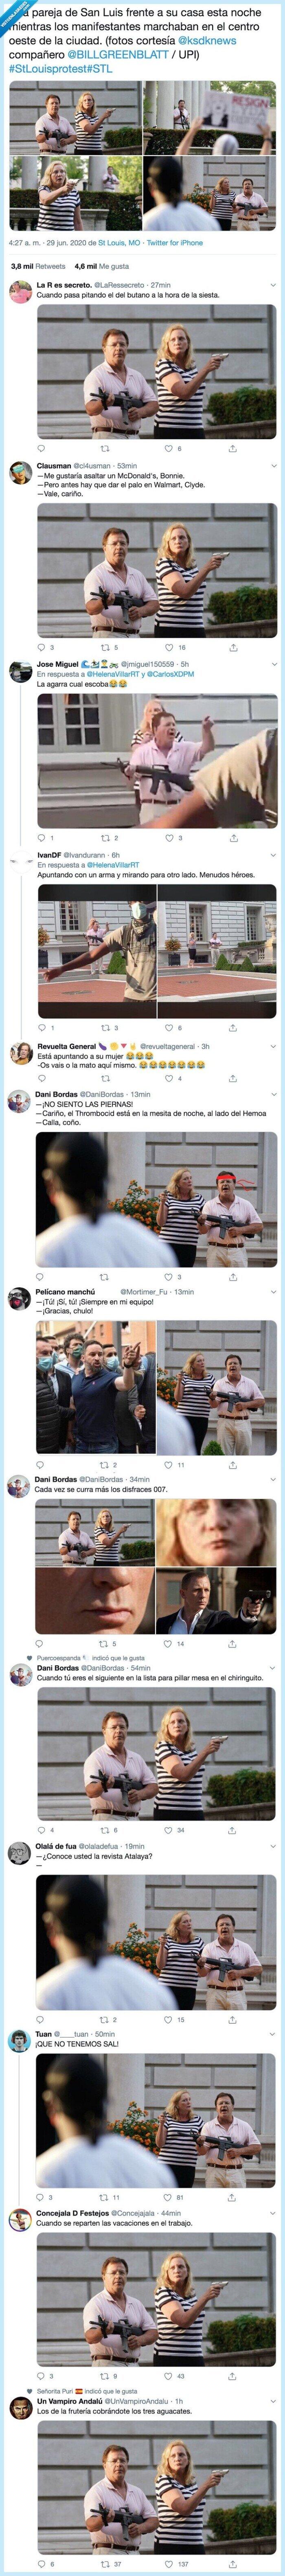 armas,memes,protesters,sant louis,stlouisprotest